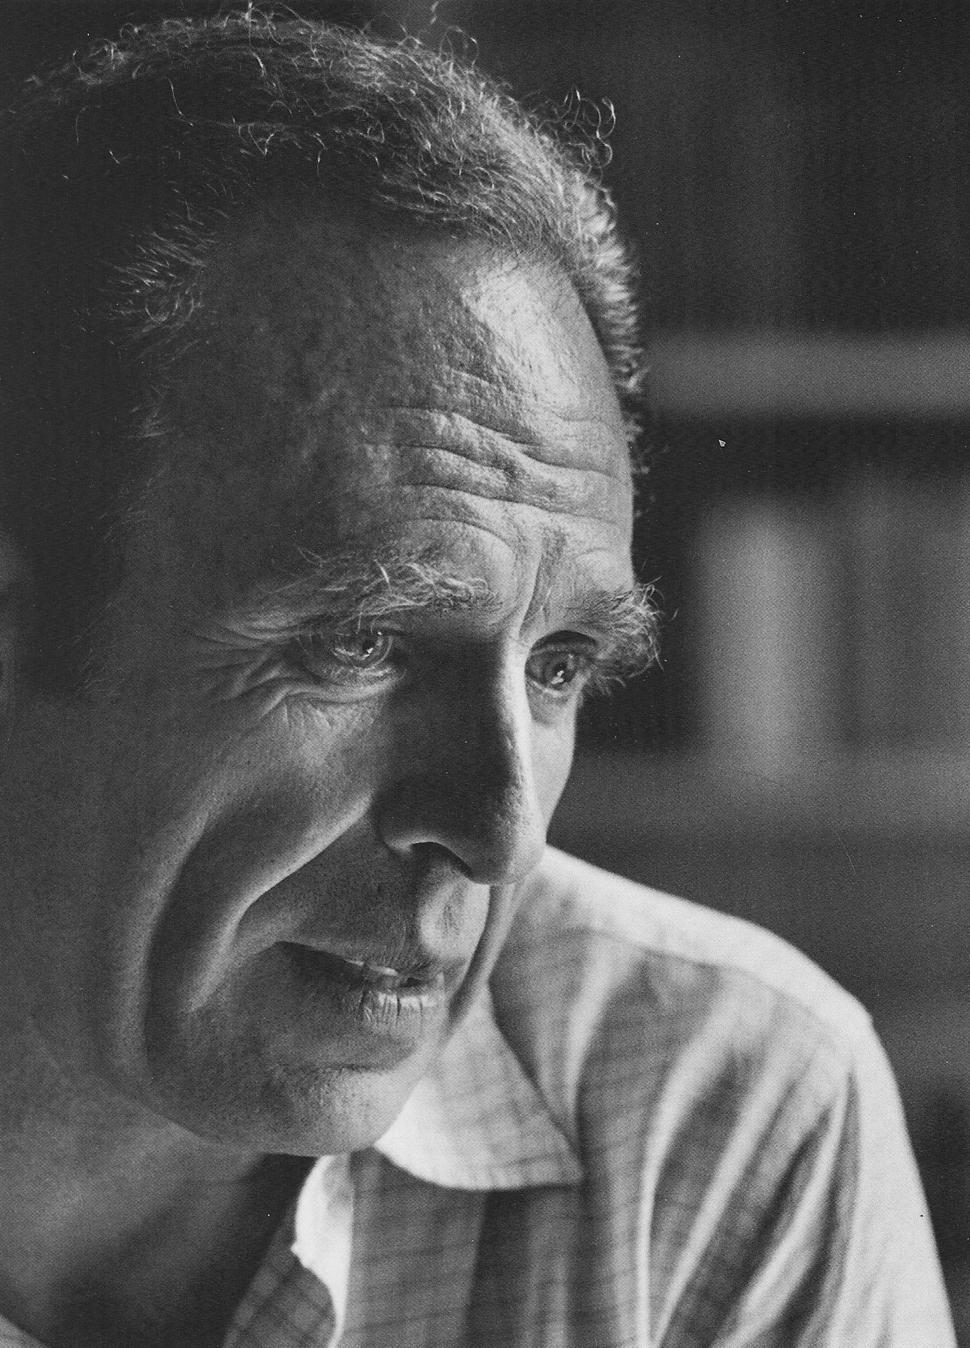 Adolfo Bioy Casares 1968